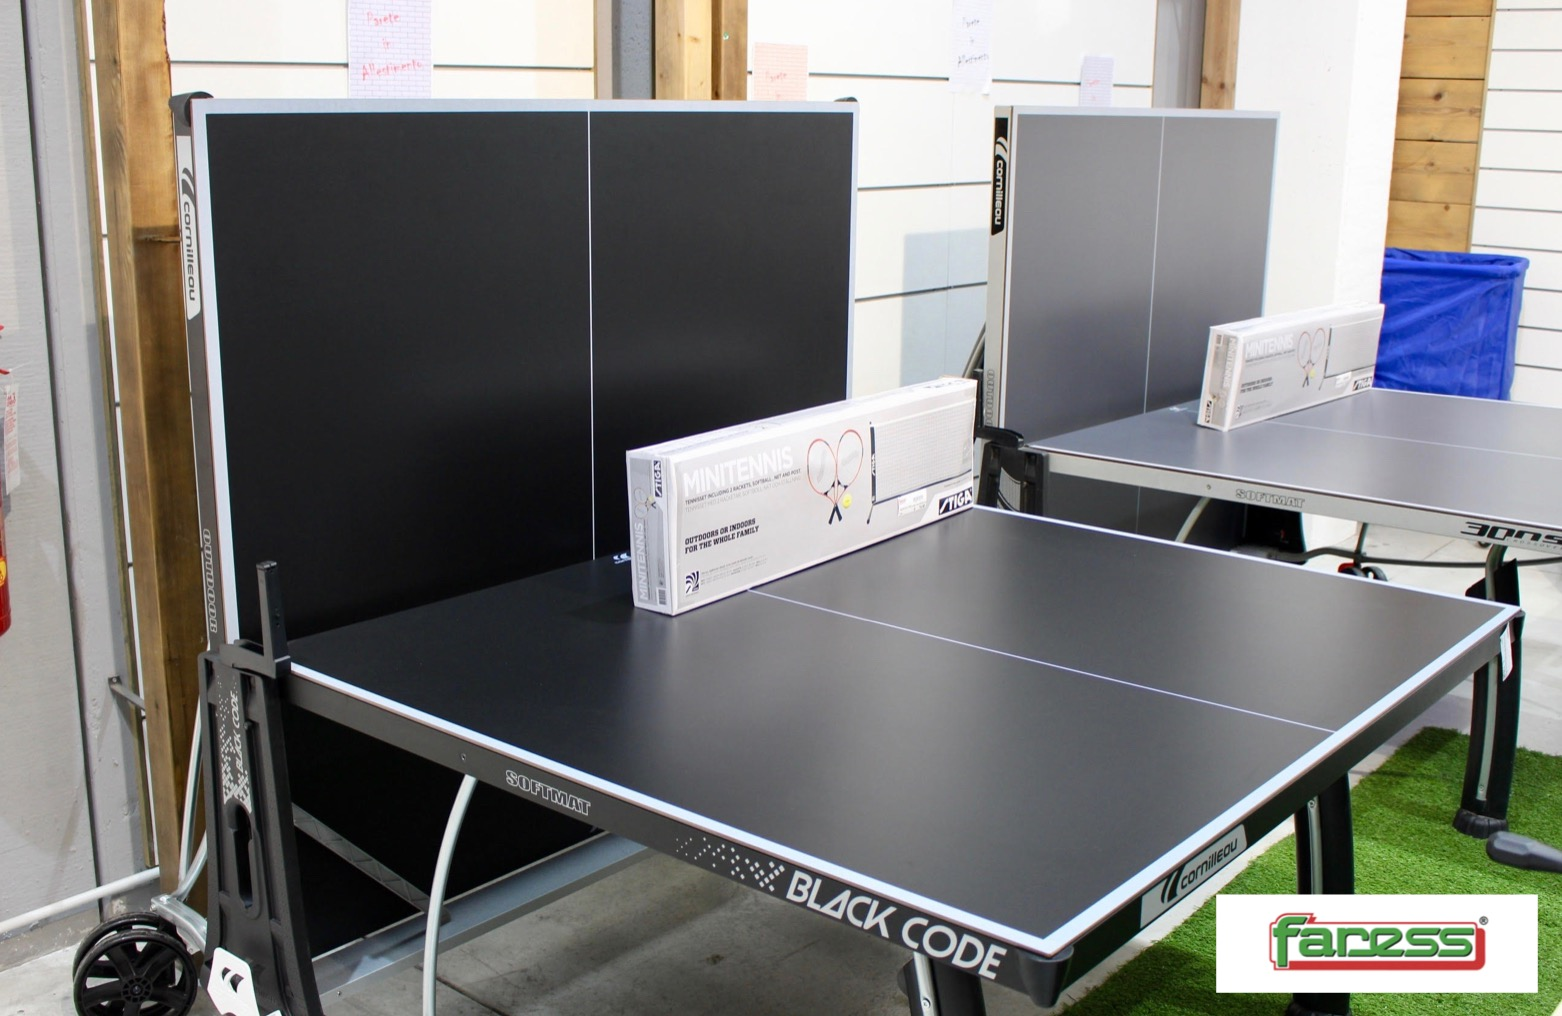 Vendita Tavoli Ping Pong Kettler A Roma I Migliori Modelli